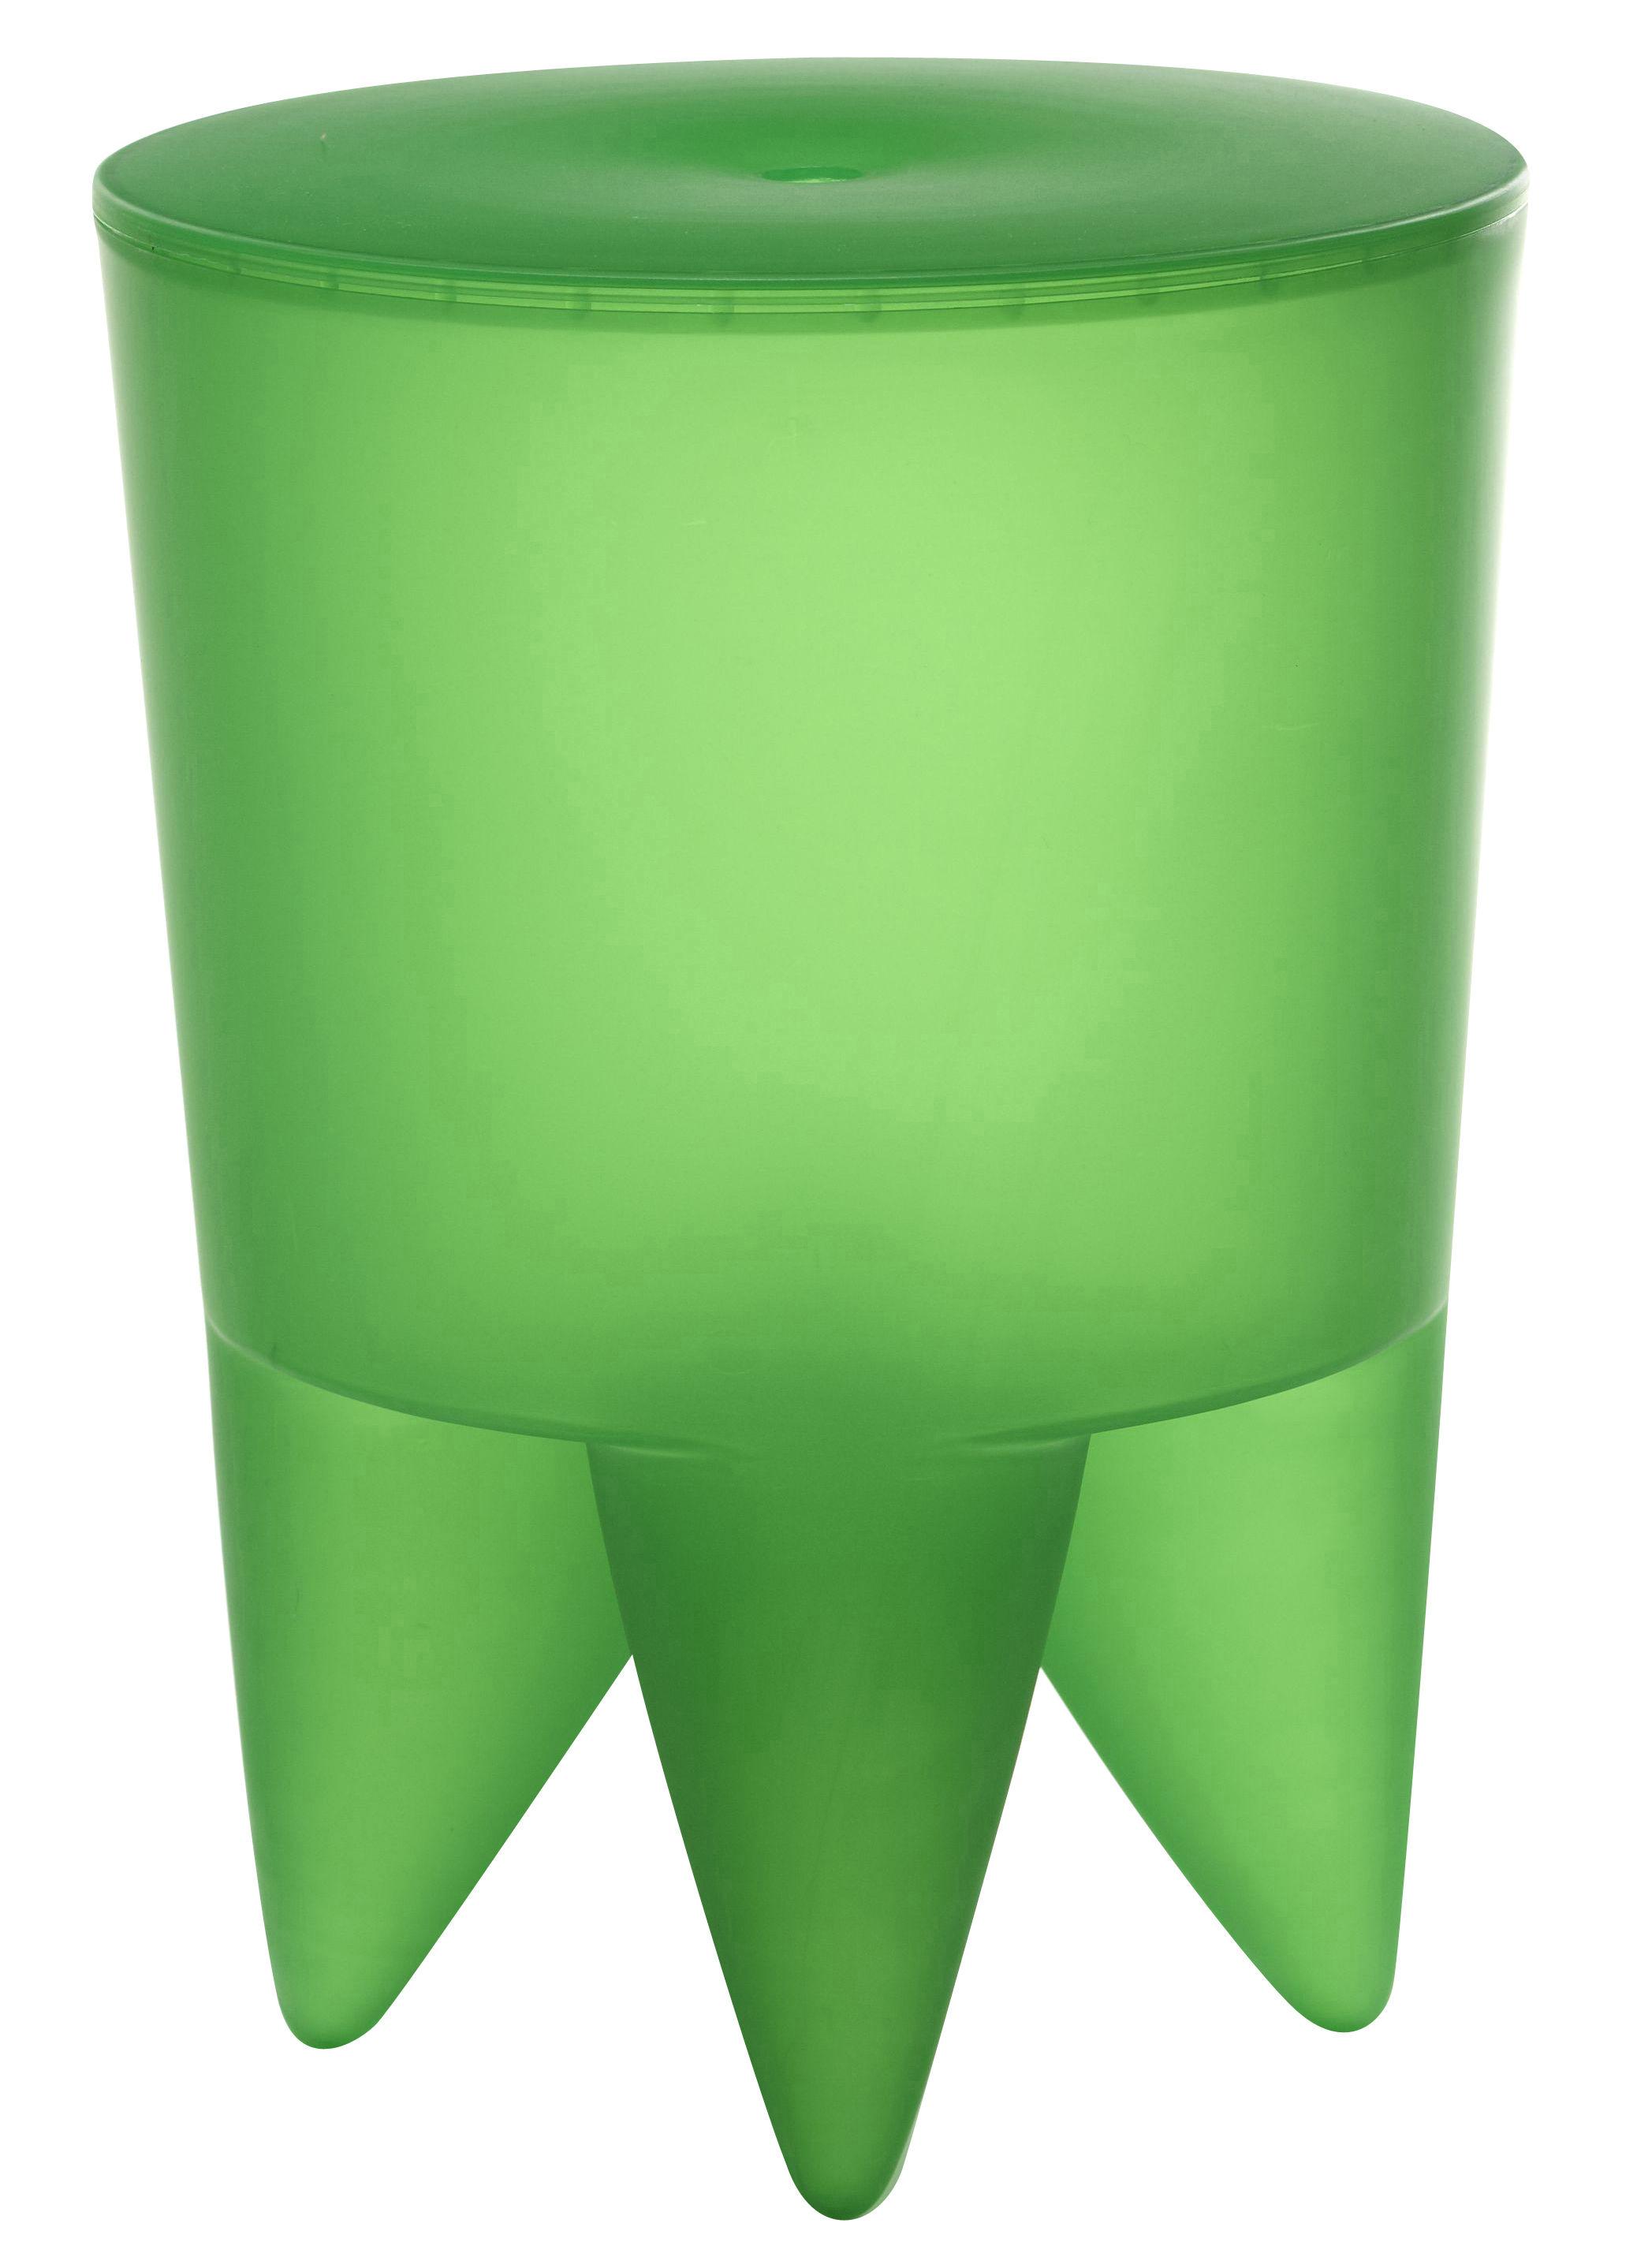 Mobilier - Mobilier Ados - Tabouret New Bubu 1er / Coffre - Plastique - XO - Gazon translucide - Polypropylène